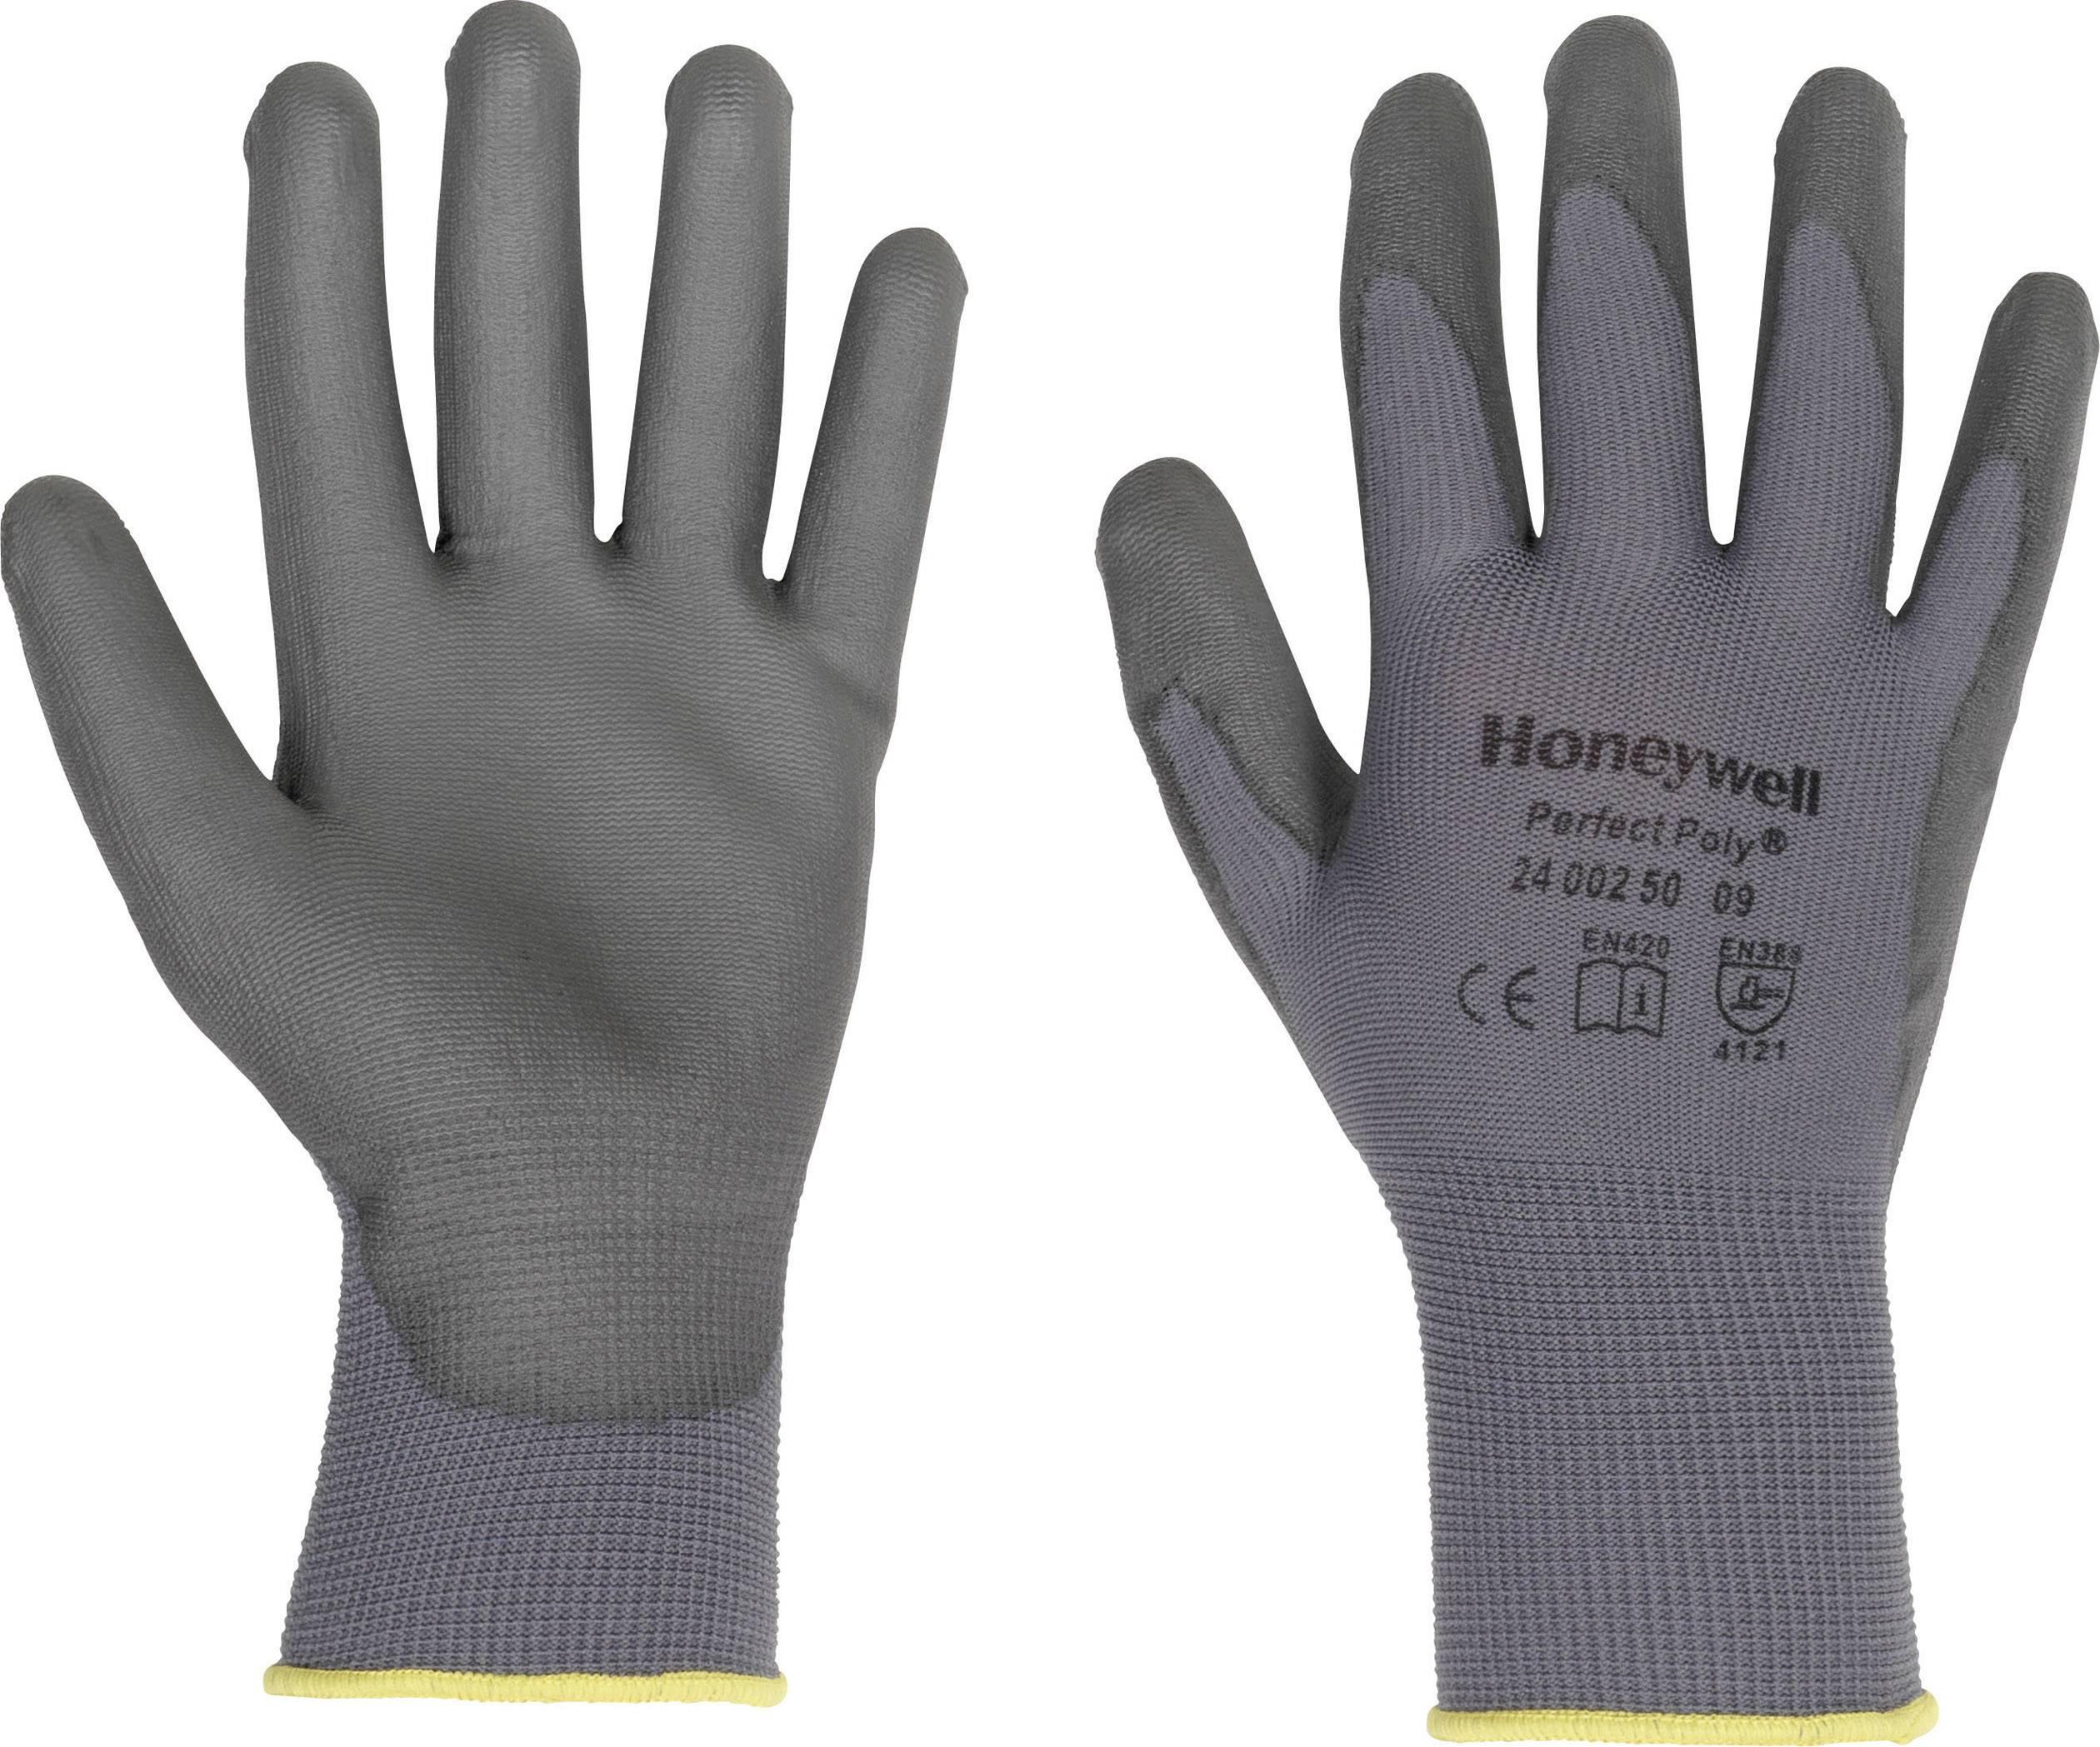 Pracovné rukavice Perfect Fit GANTS GRIS PERFECTPOLY 2400250, velikost rukavic: 6, XS